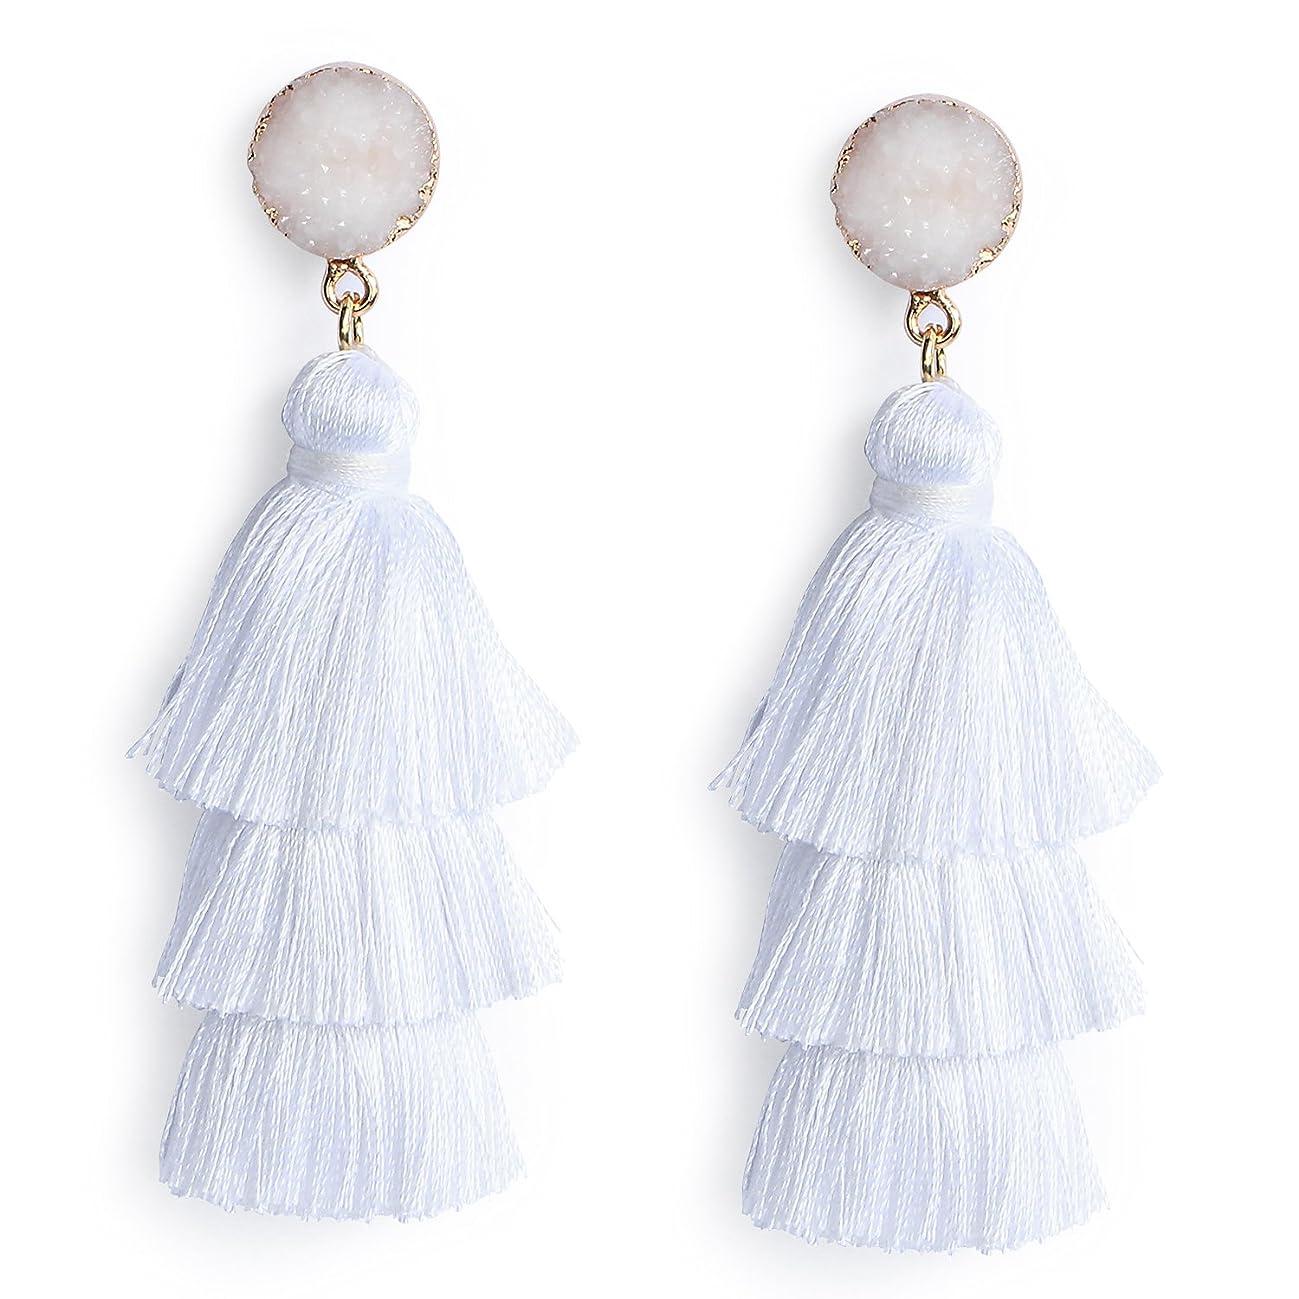 Colorful Layered Tassel Earrings Bohemian Dangle Drop Earrings Tiered Tassel Druzy Stud Earrings Gifts for Women Girls